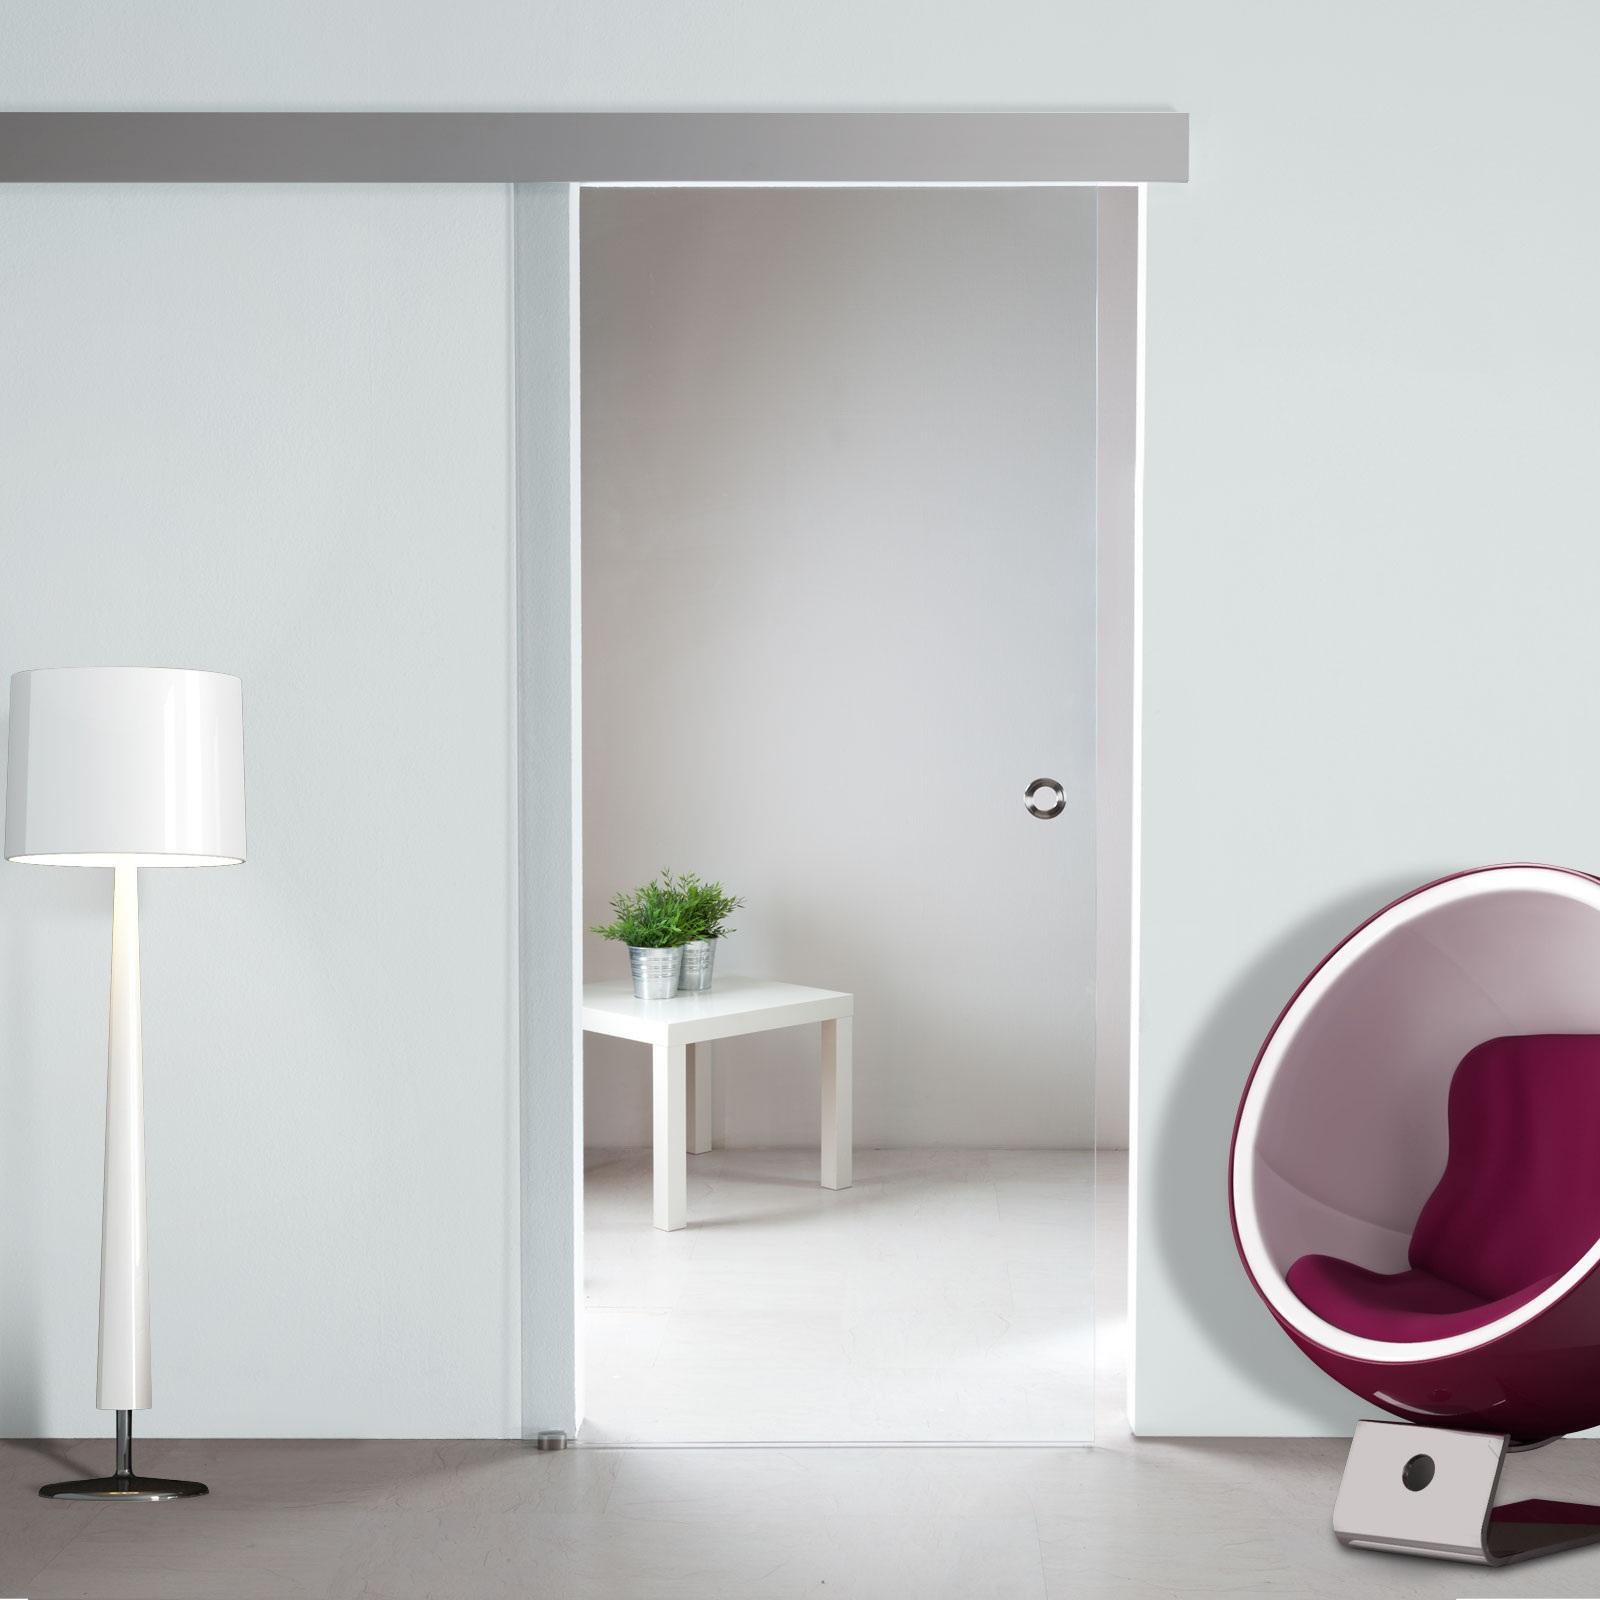 glasschiebet r sd722 klarglas mit griffmuschel edelstahl. Black Bedroom Furniture Sets. Home Design Ideas